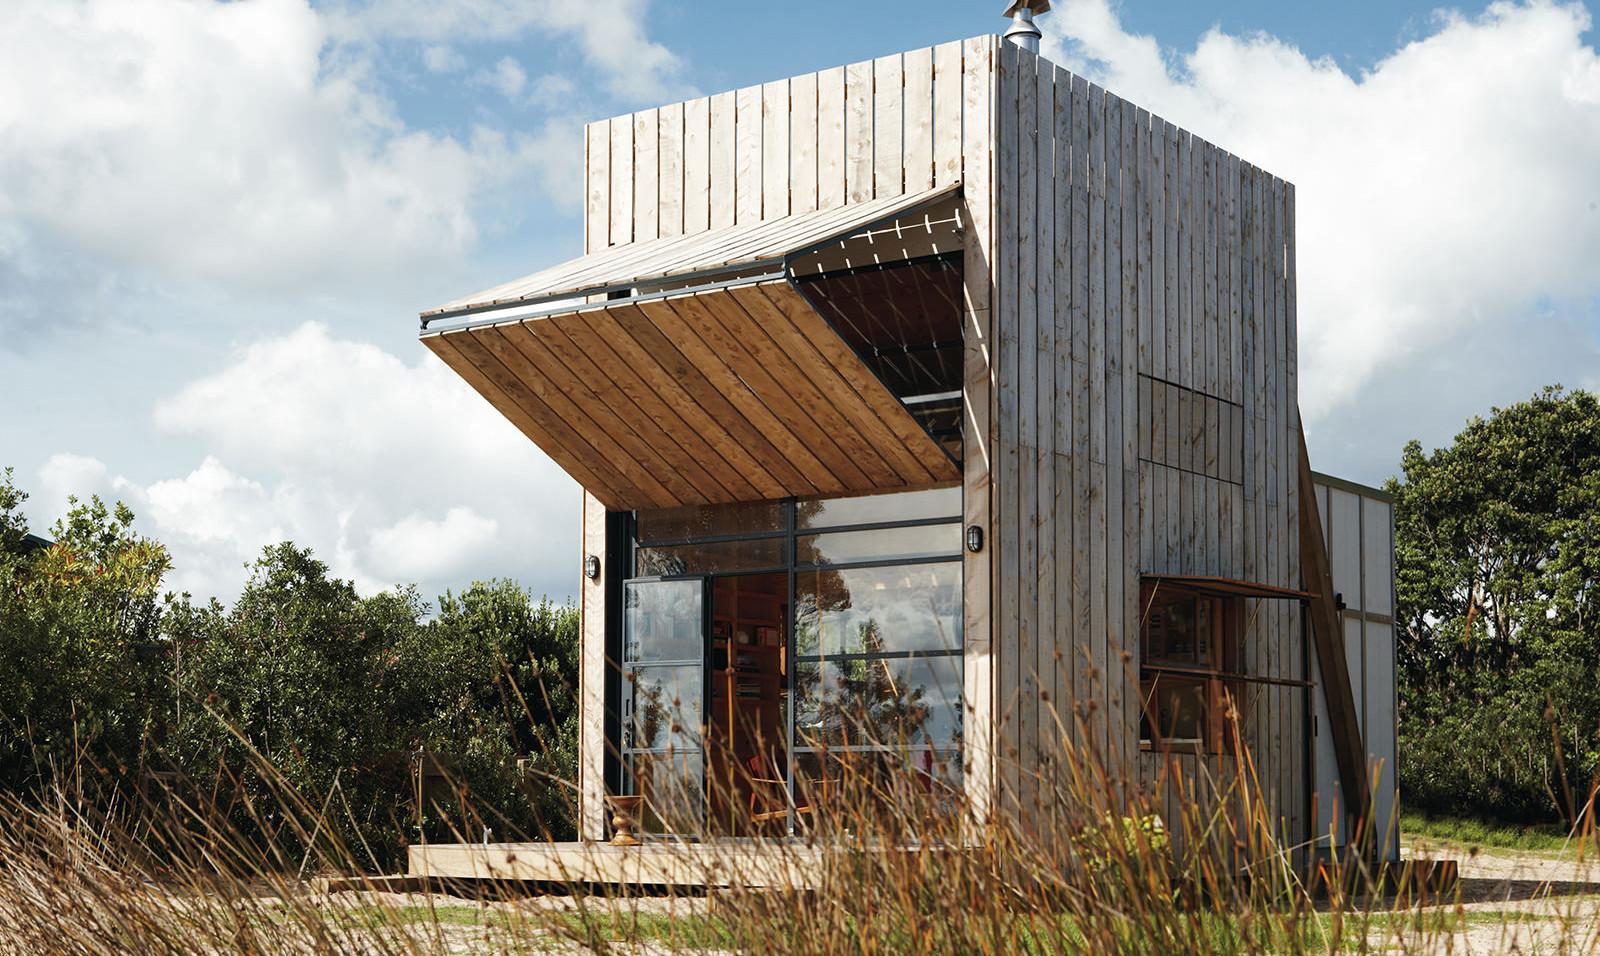 hut-on-sleds-crosson-architects-5.jpg